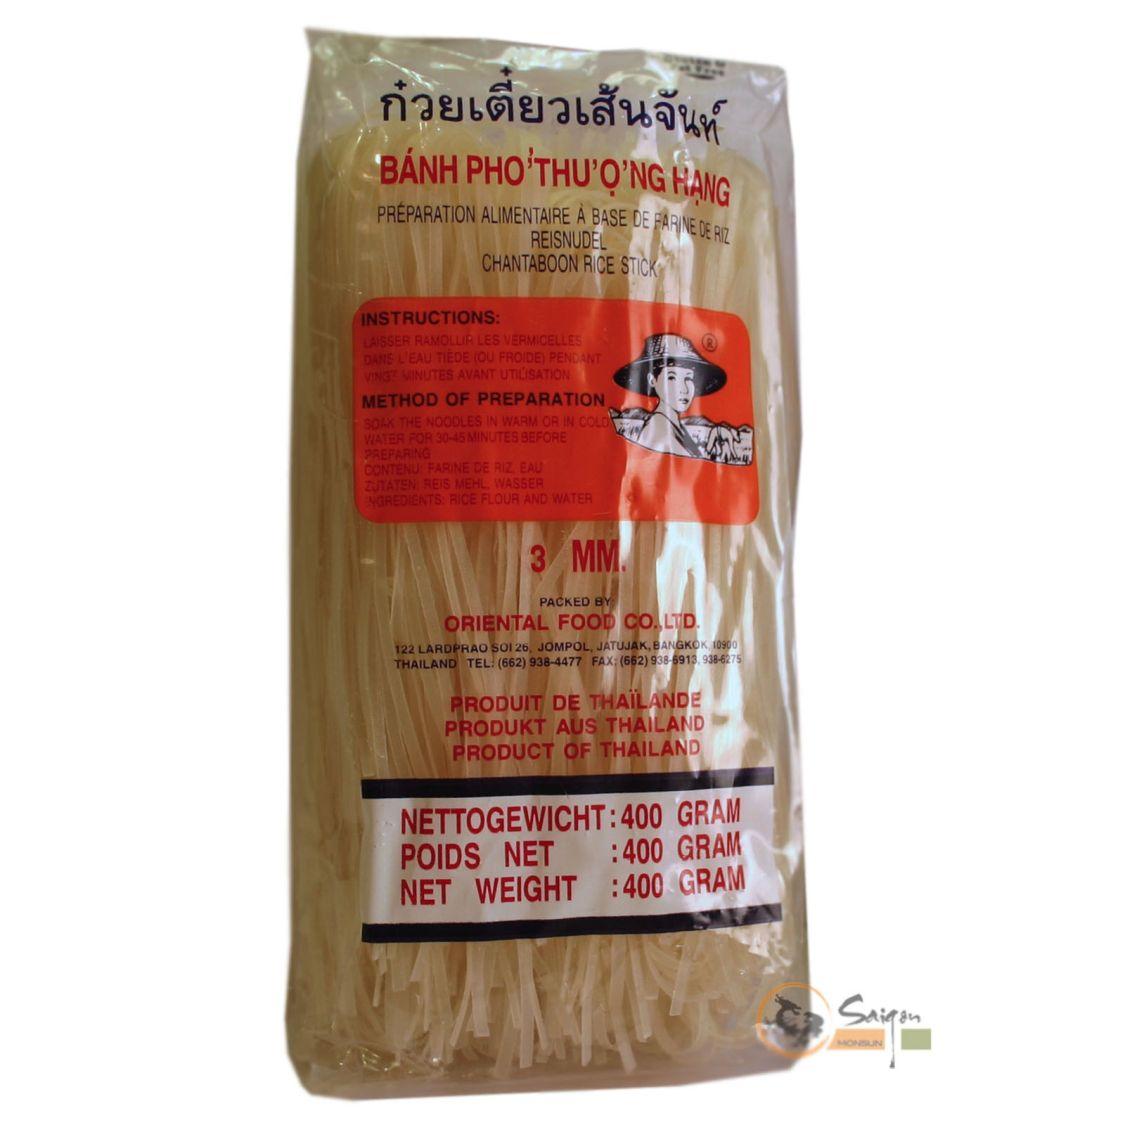 Farmer 3mm Reisbandnudel 400g Reisnudeln, super für Pad Thai, Pho, Bratnudeln